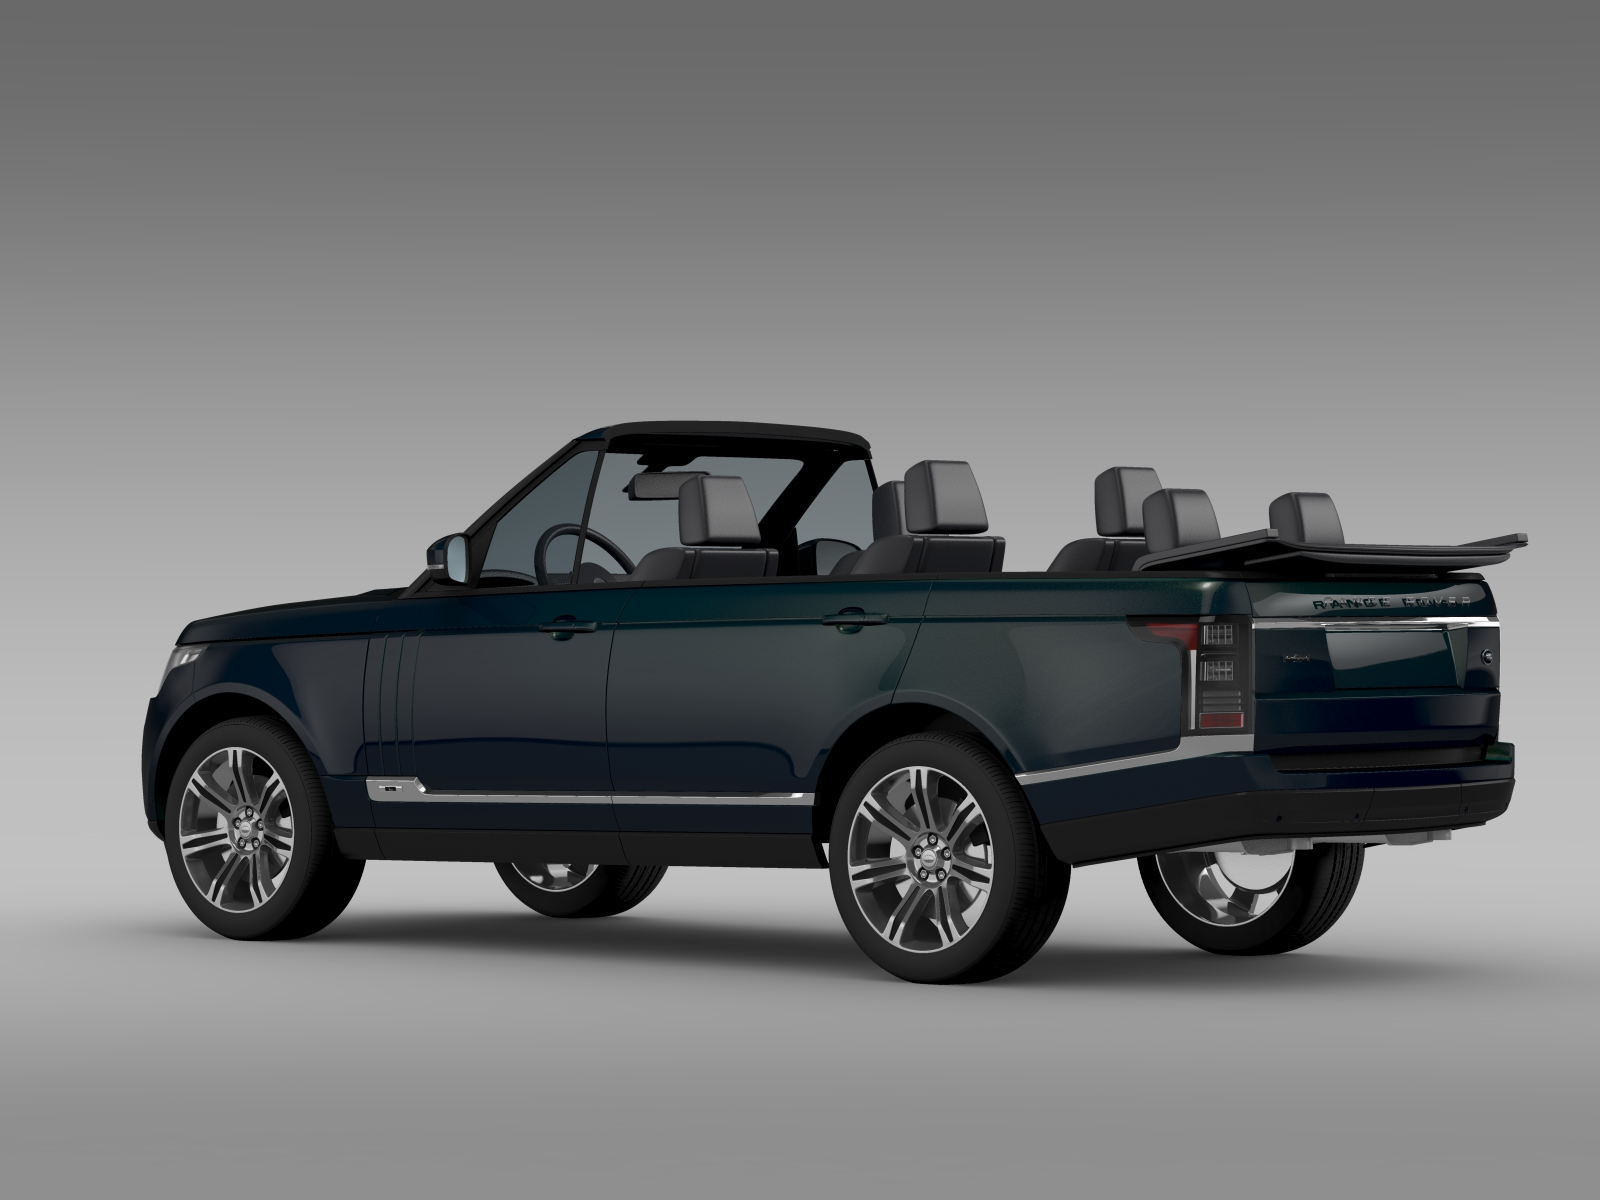 range rover autobiography black lwb cabrio l405 20 3d model buy range rover autobiography. Black Bedroom Furniture Sets. Home Design Ideas